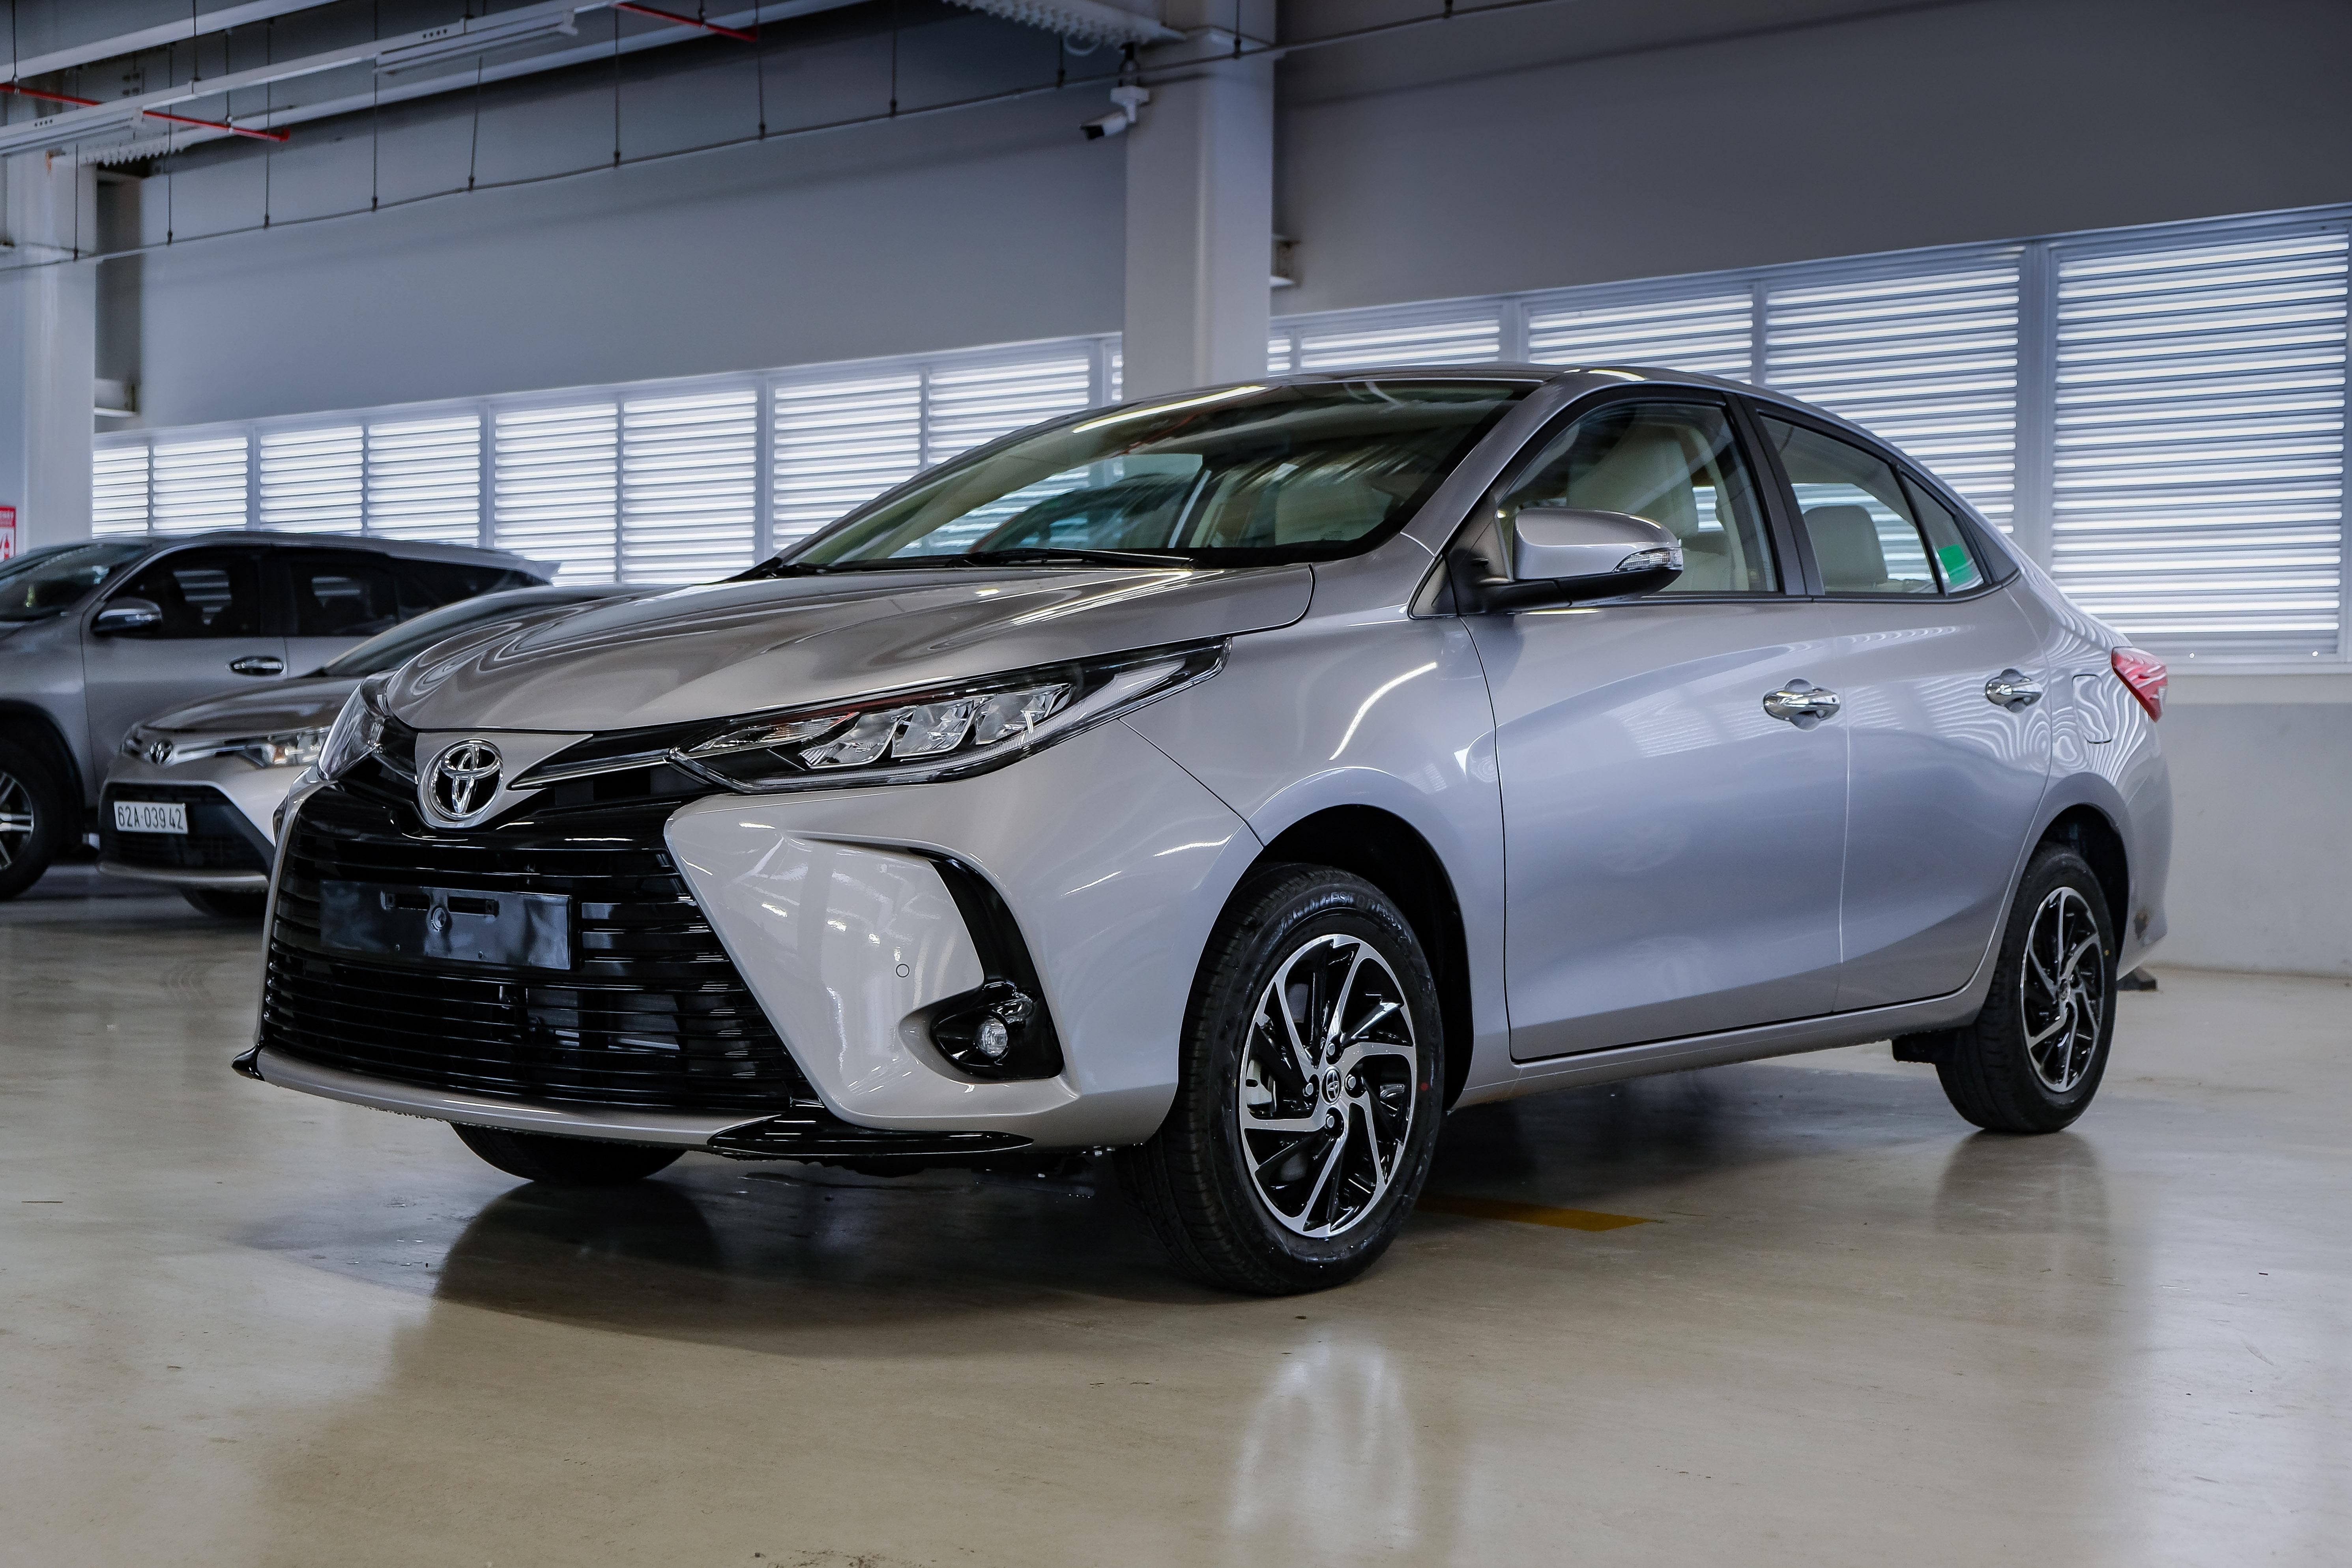 so sanh Hyundai Accent va Toyota Vios 2021 anh 3